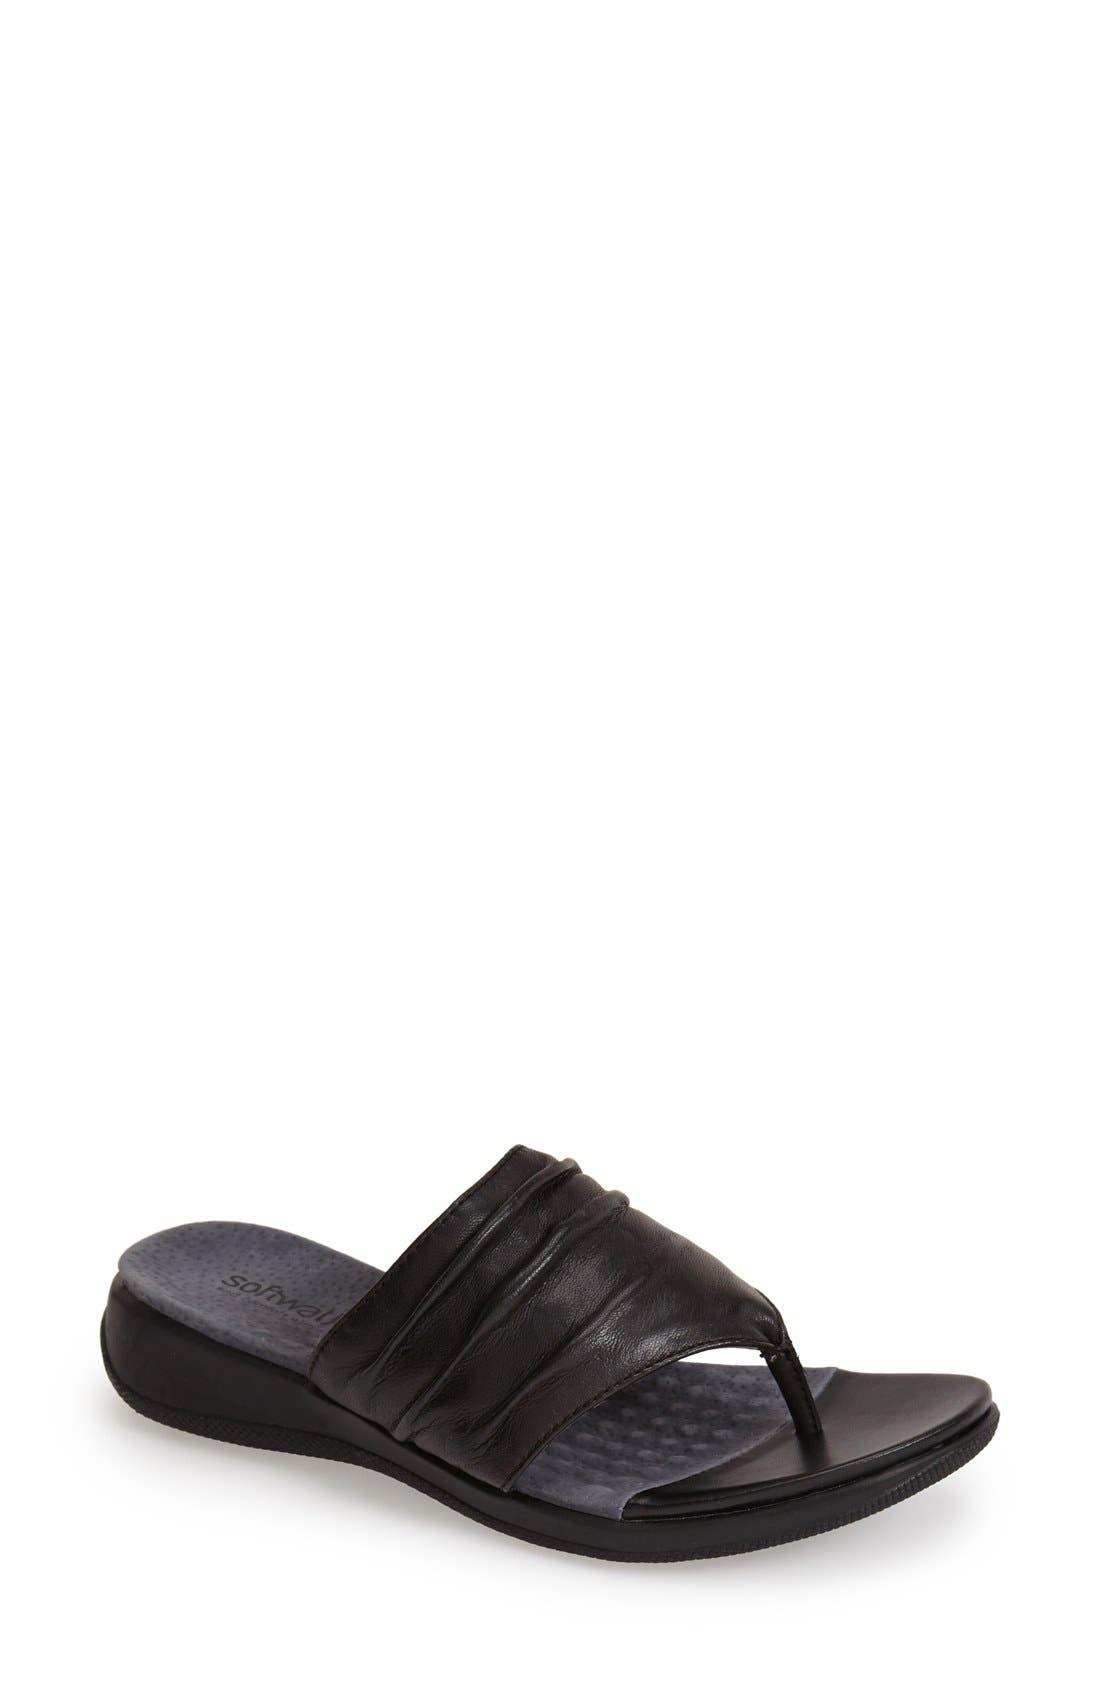 'Toma' Thong Sandal,                         Main,                         color, 001